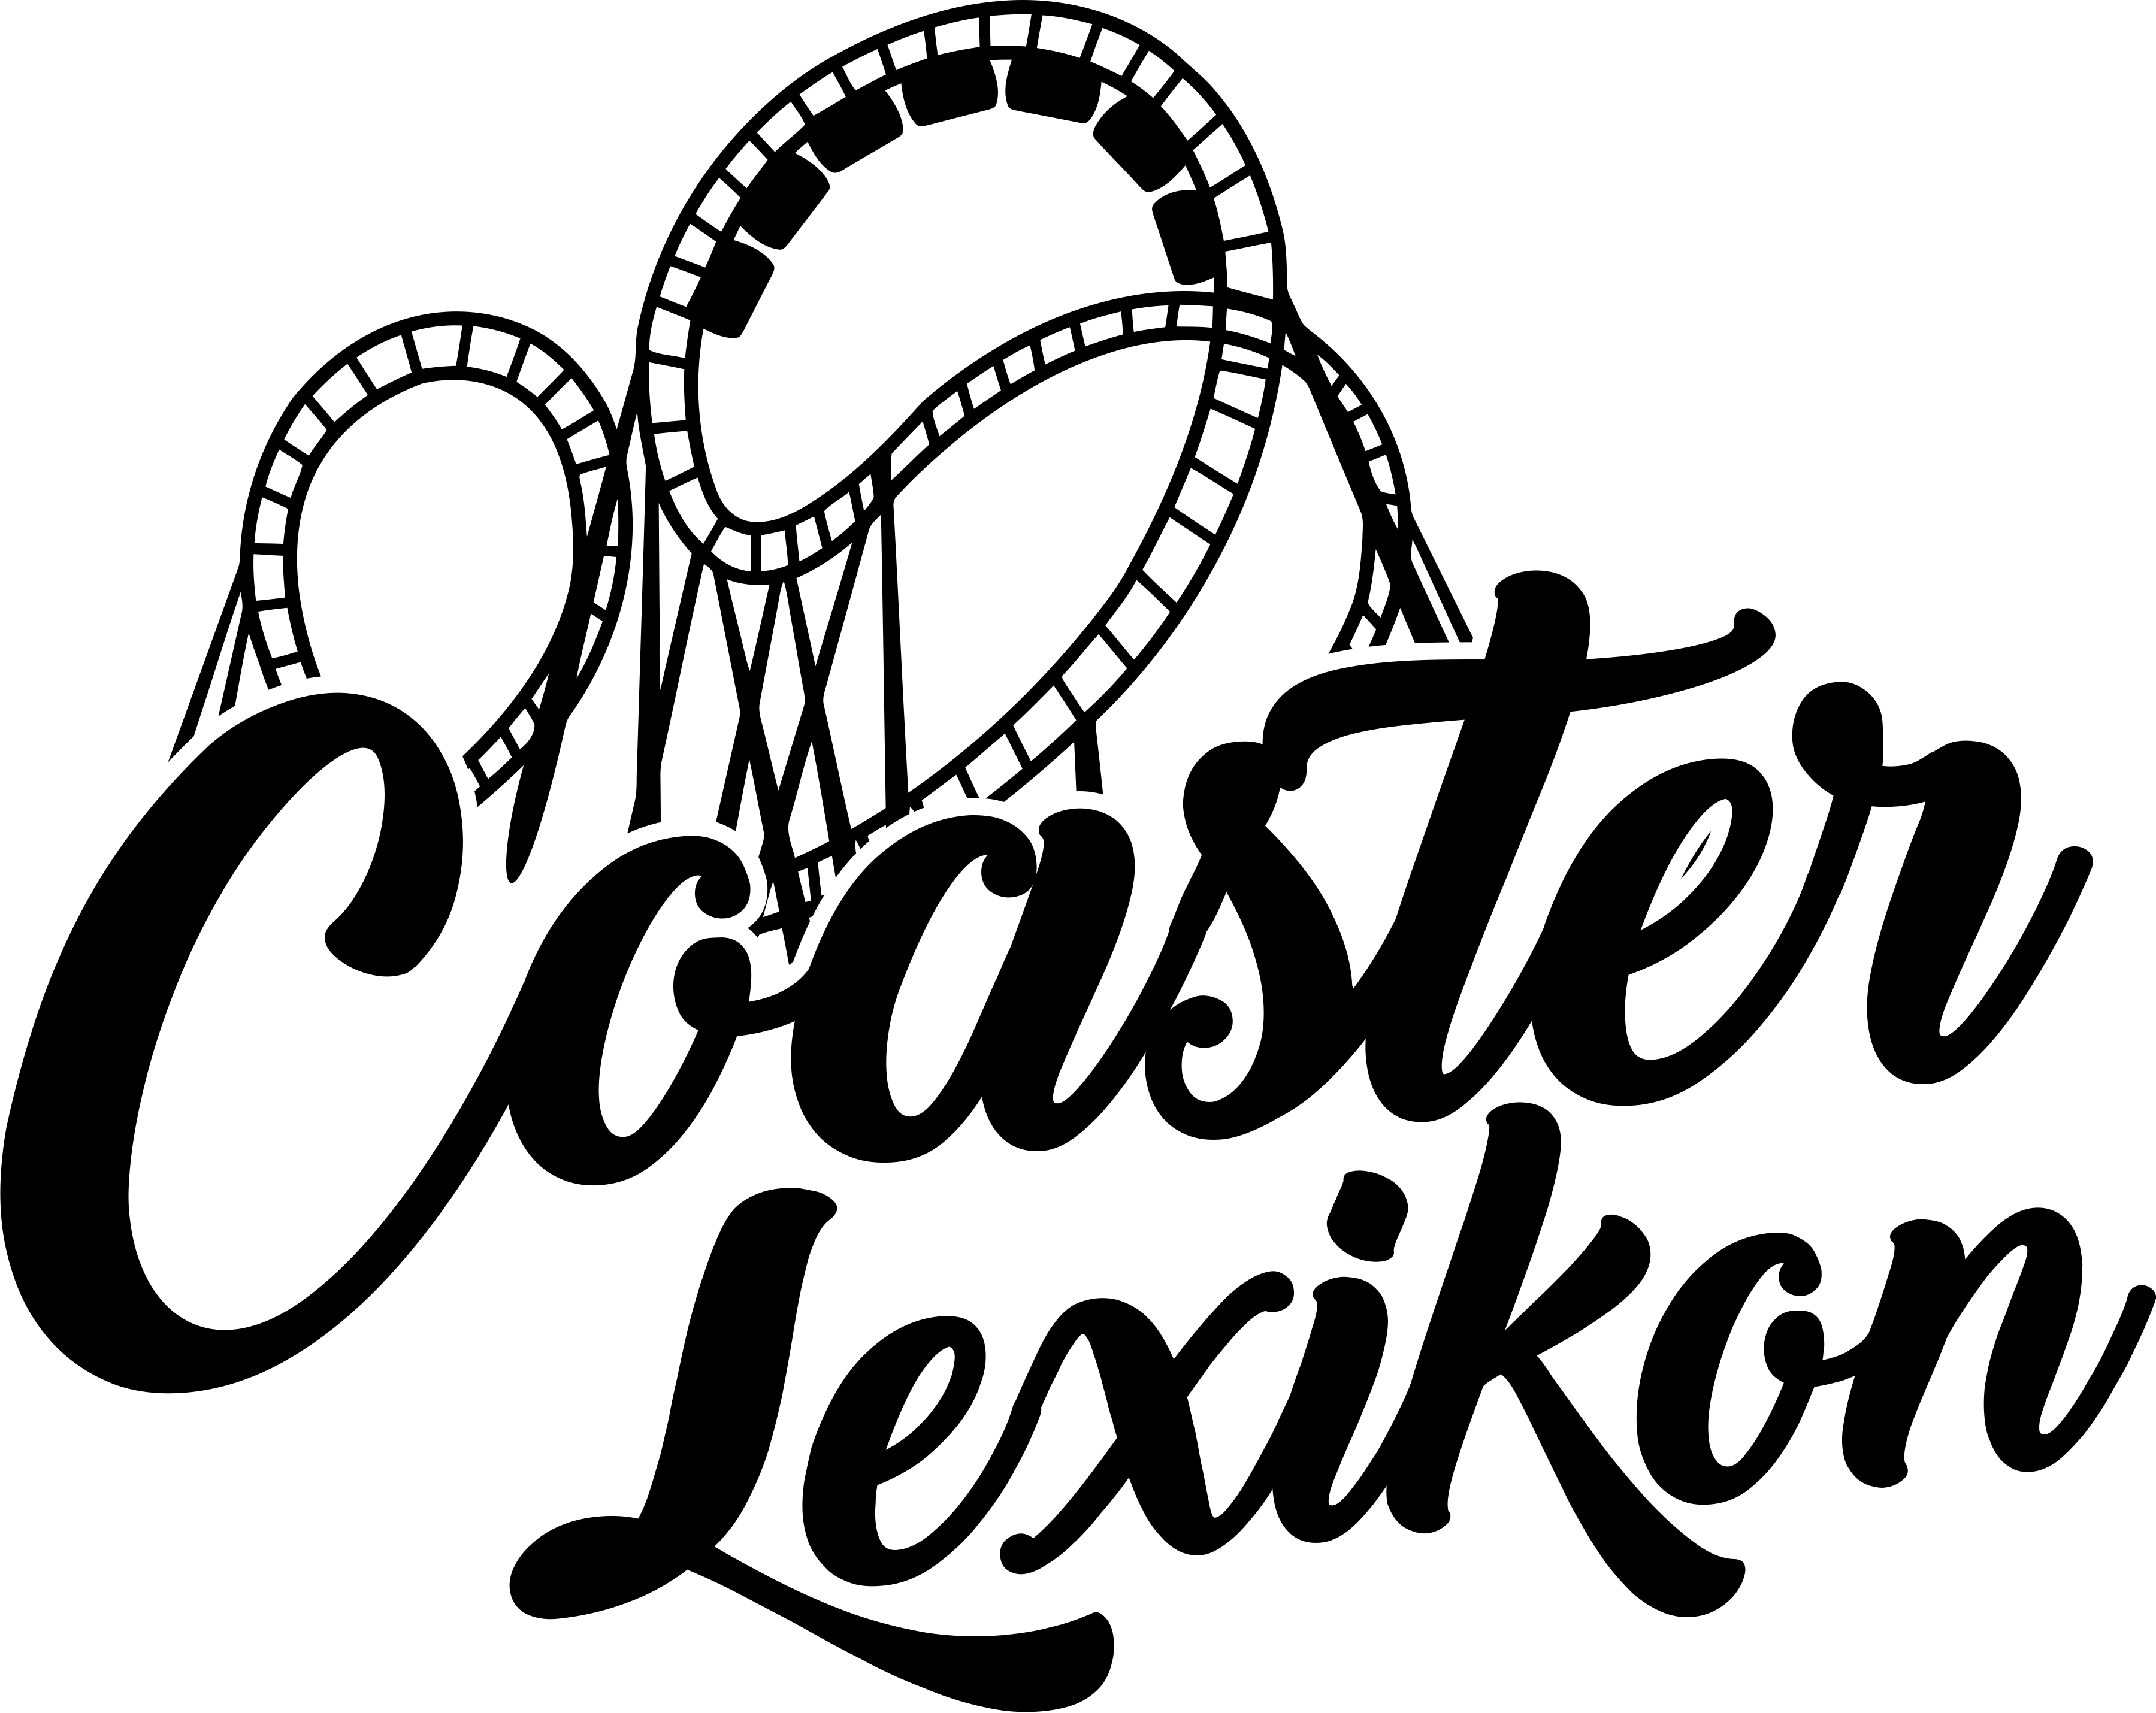 Coaster Lexikon